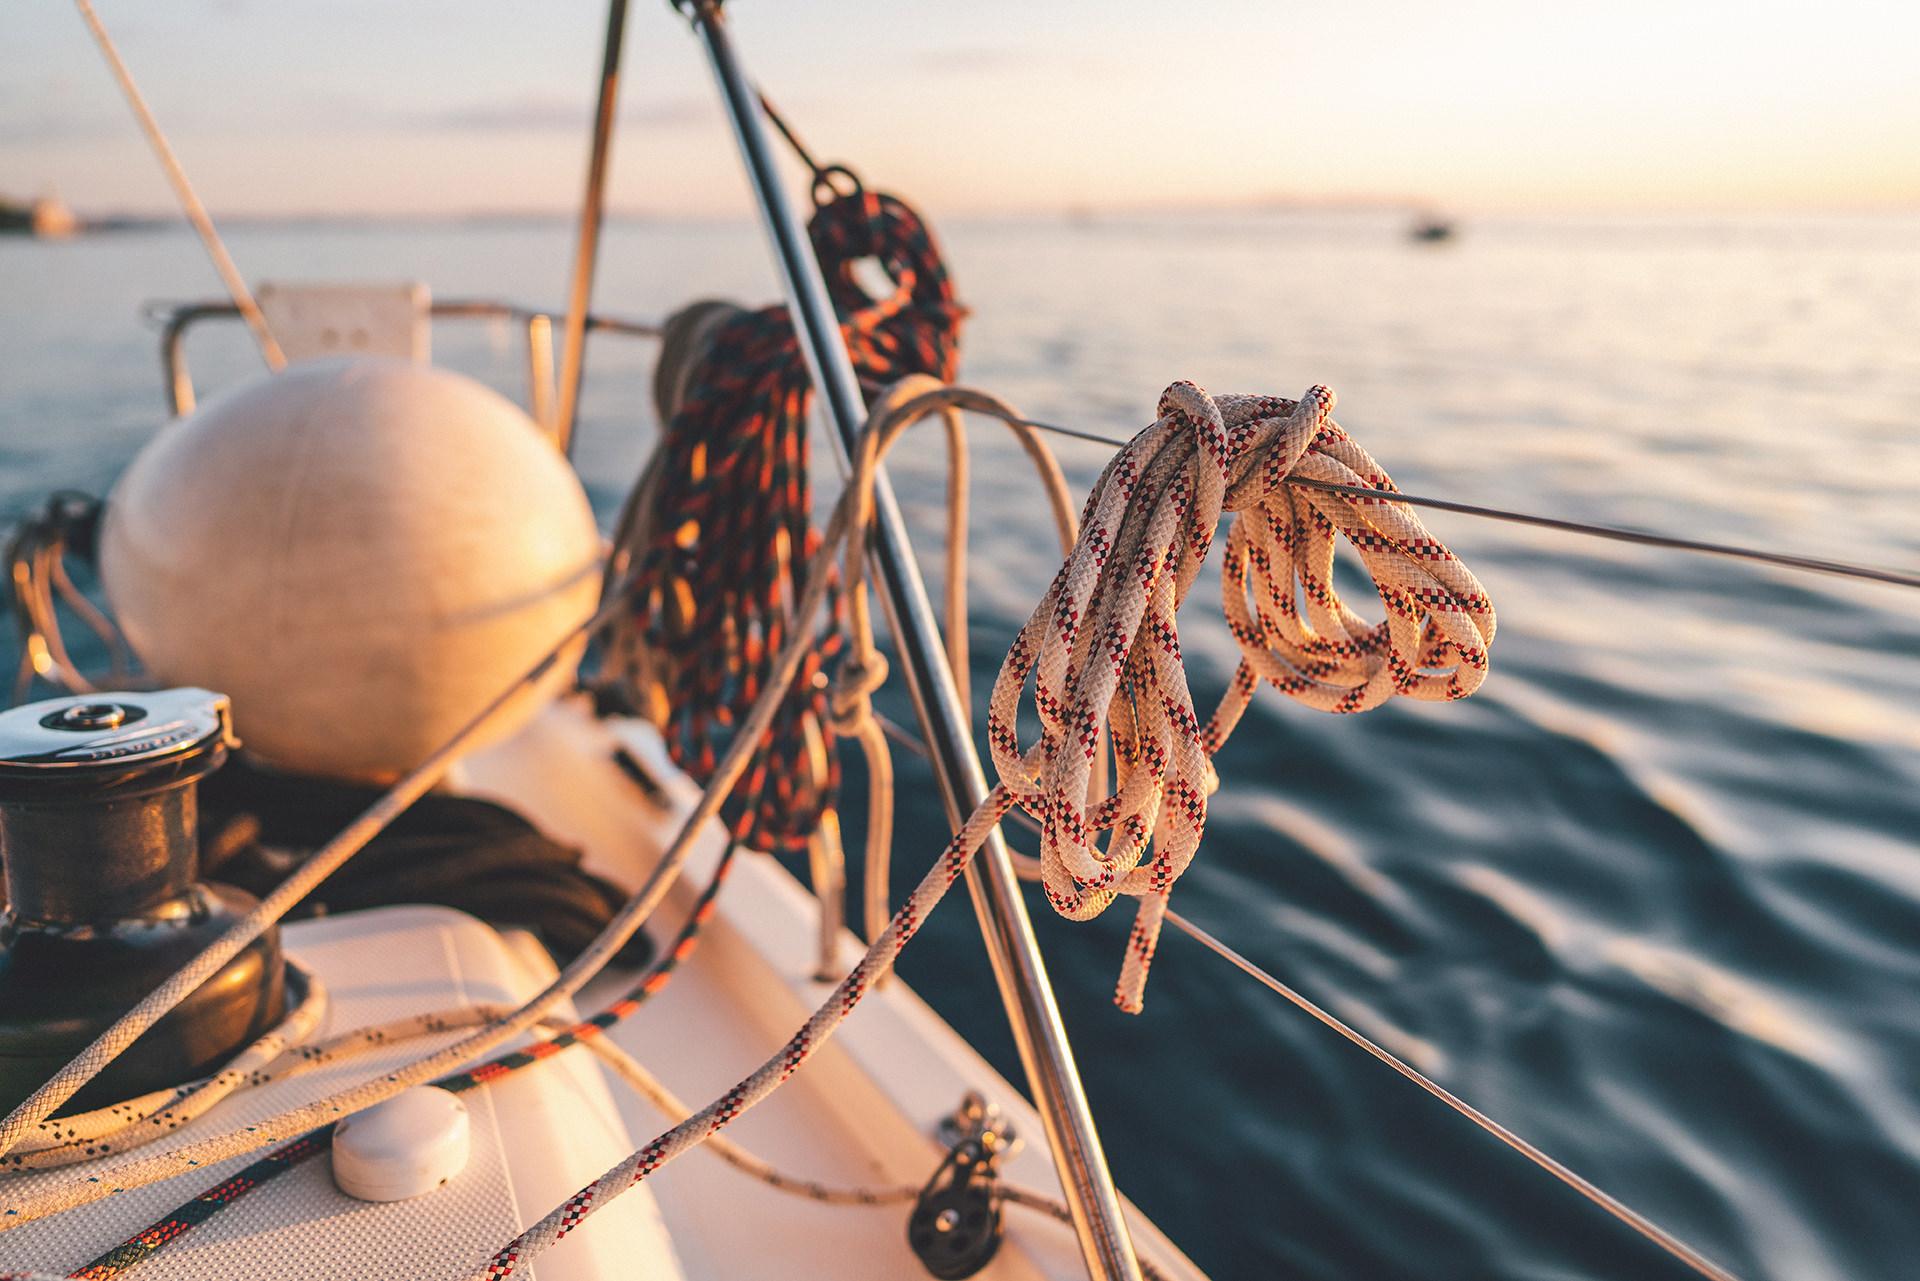 segelboot-reling-detail-seile